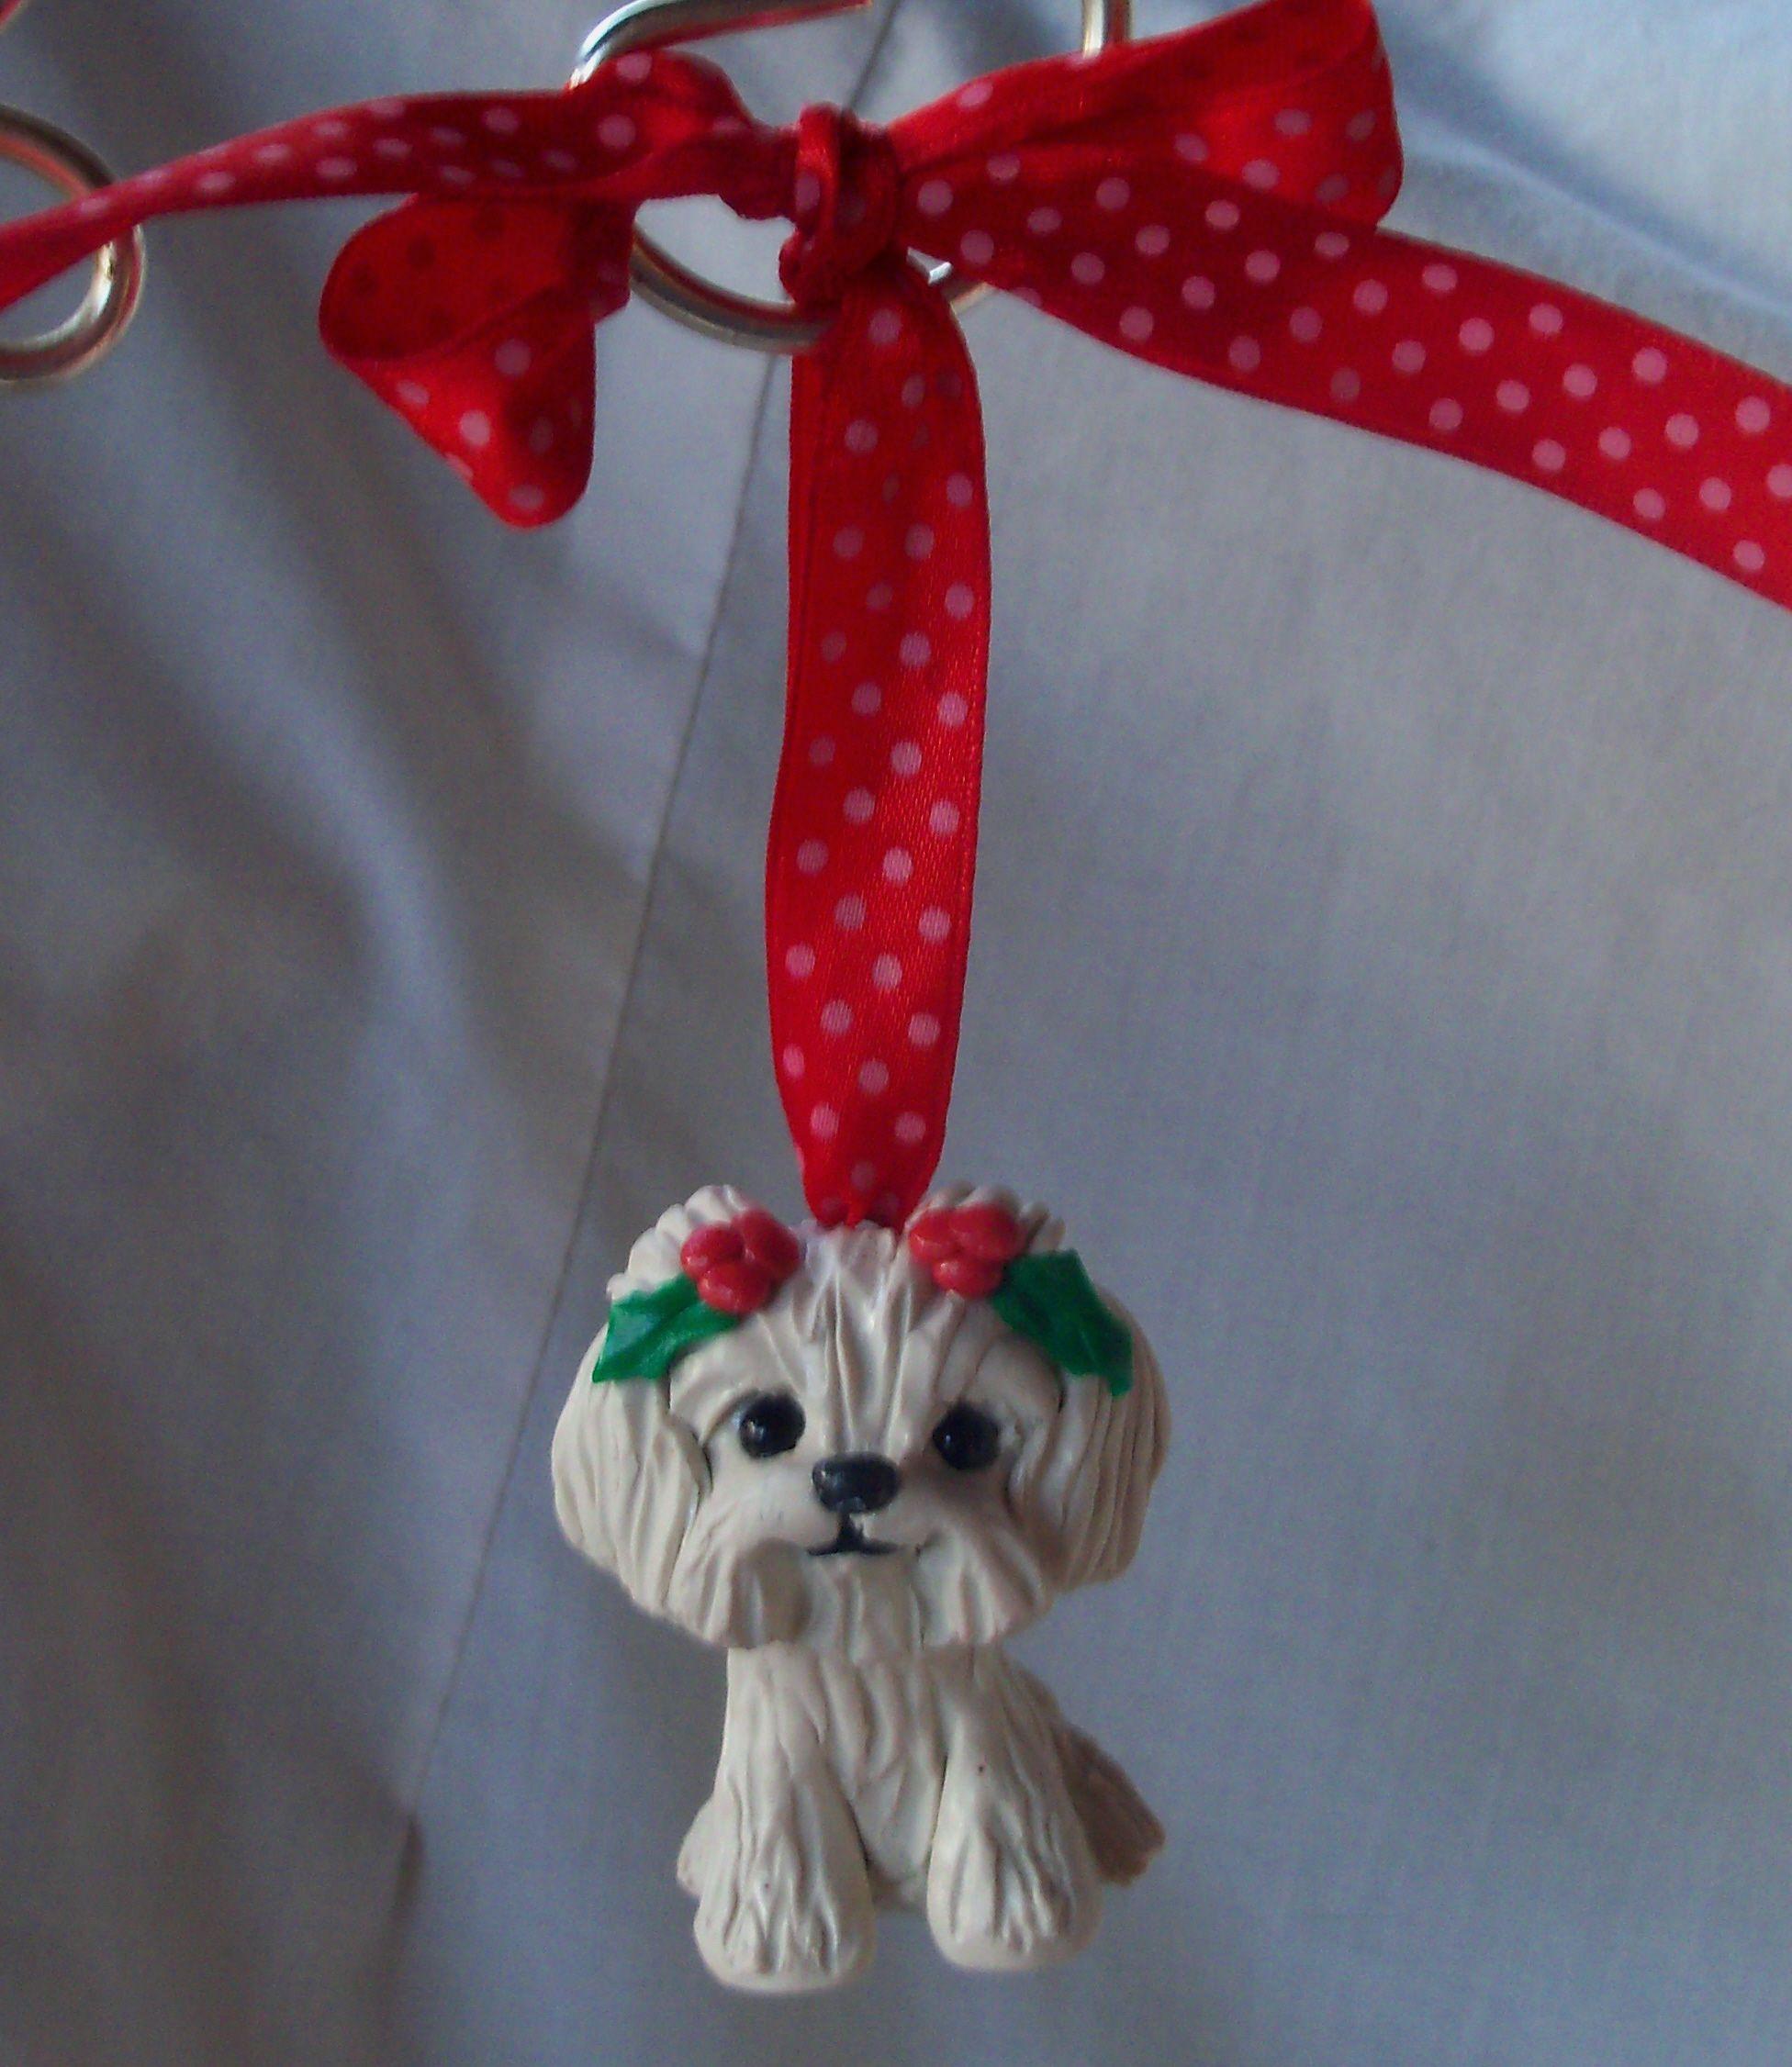 Maltese christmas ornaments - Maltese Christmas Ornament